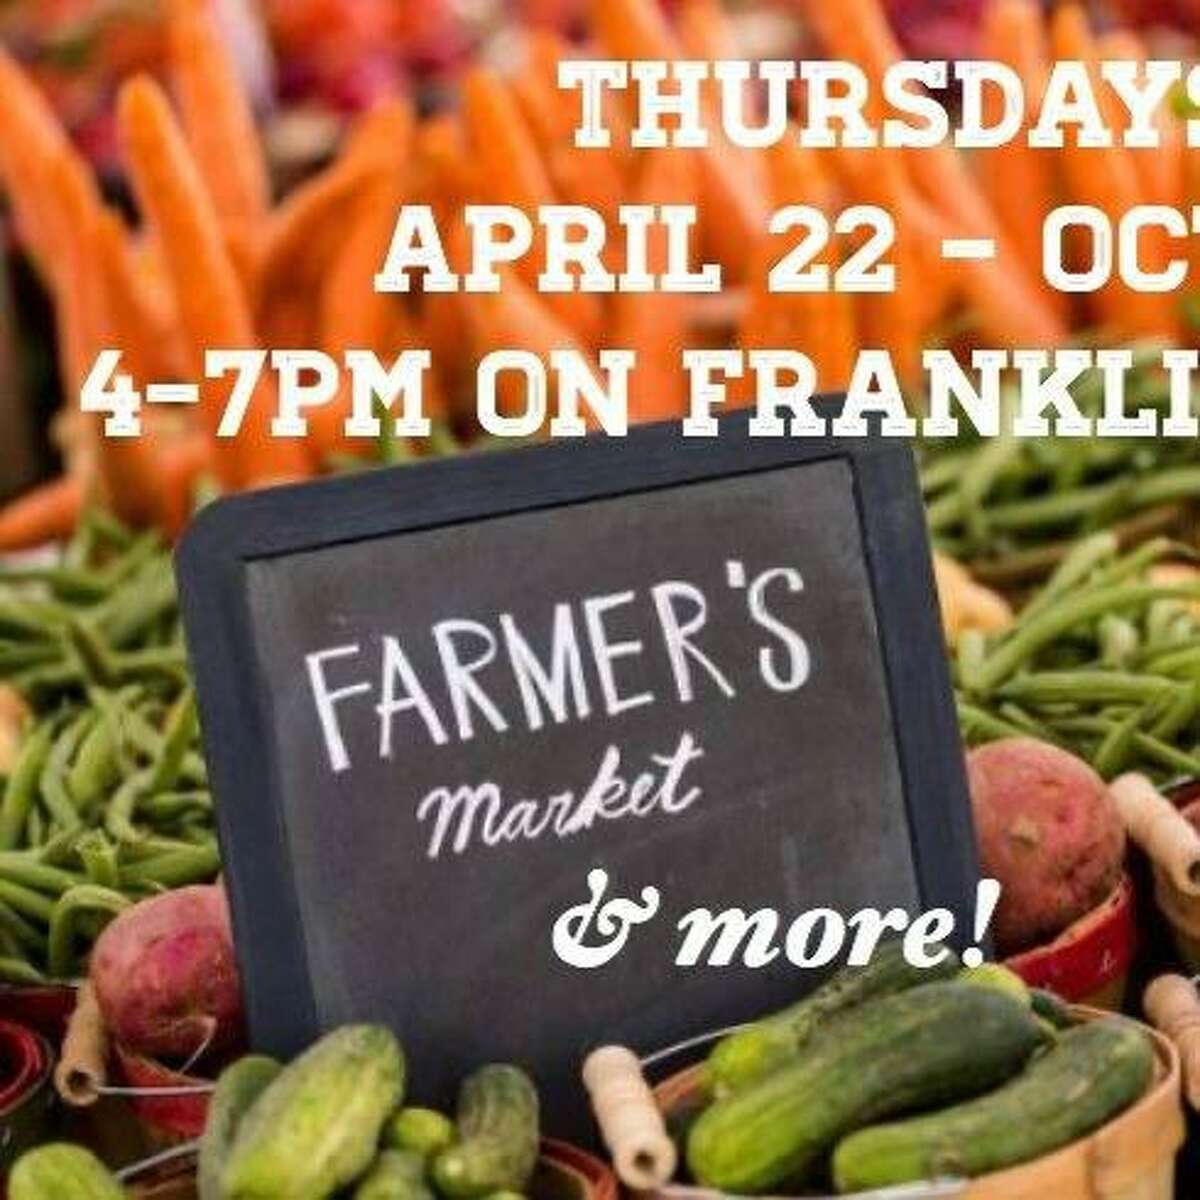 The Franklin Plaza Farmers Market opens Thursday from 4-7 p.m. in Torrington.